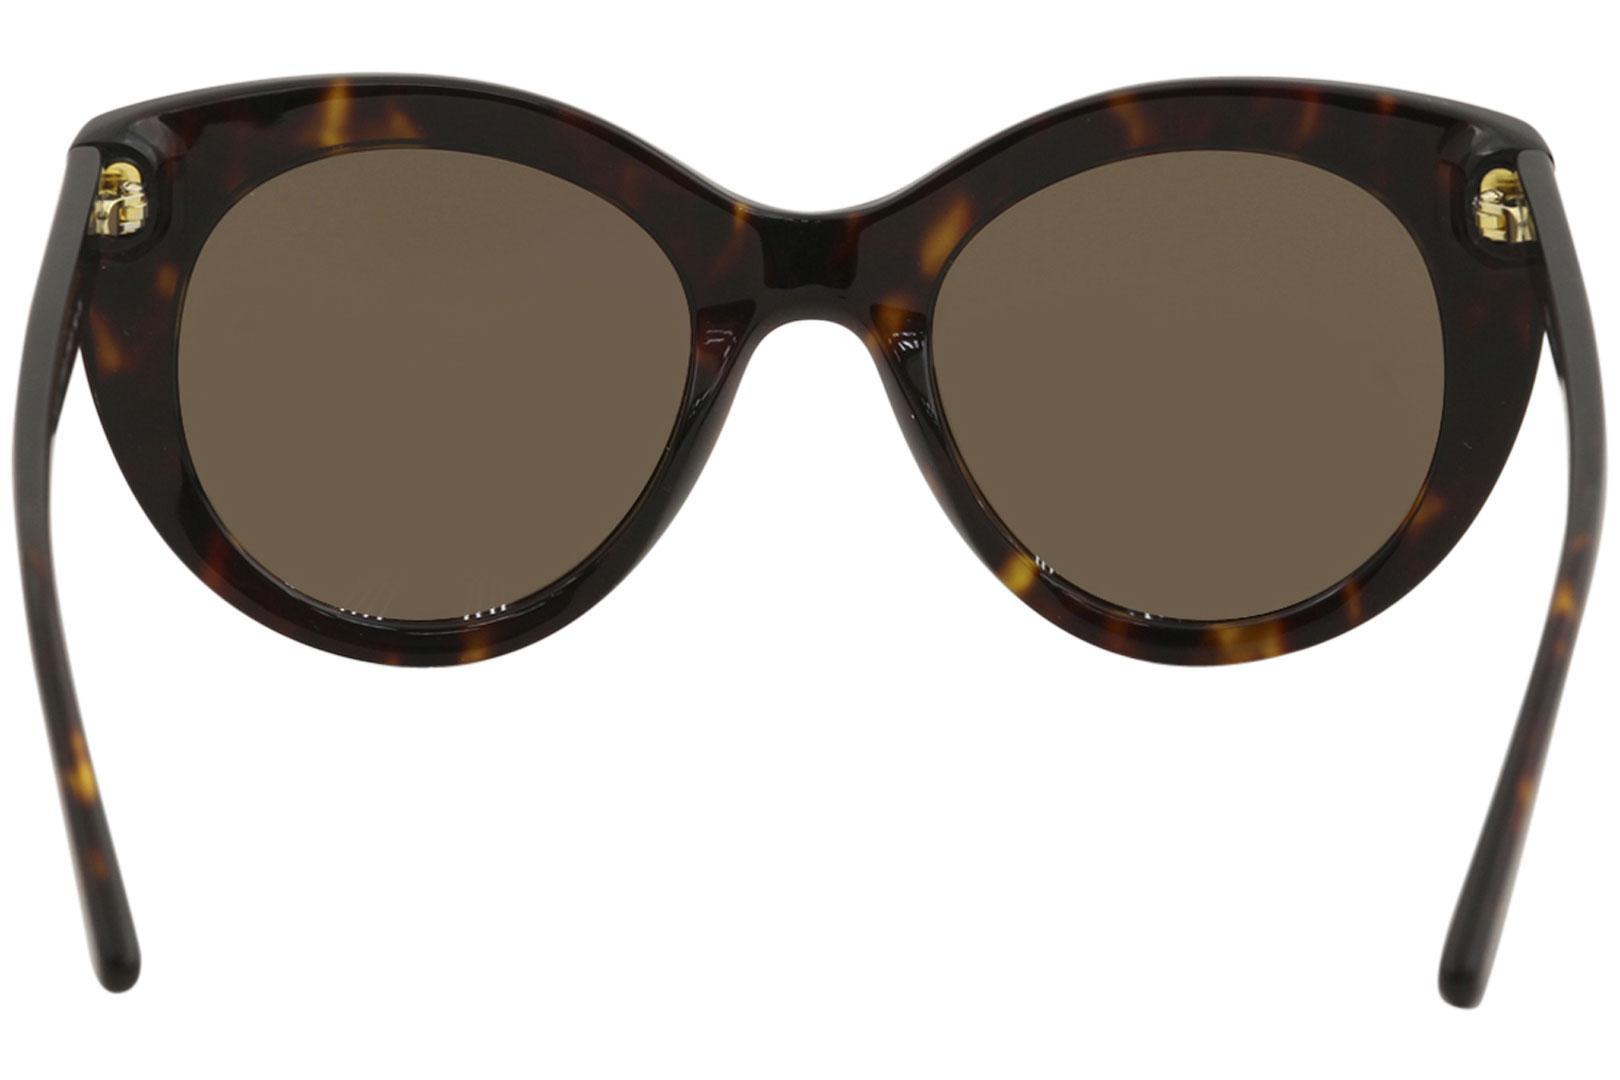 7396604b896 Tory Burch Women s TY7115 TY 7115 Fashion Cat Eye Sunglasses